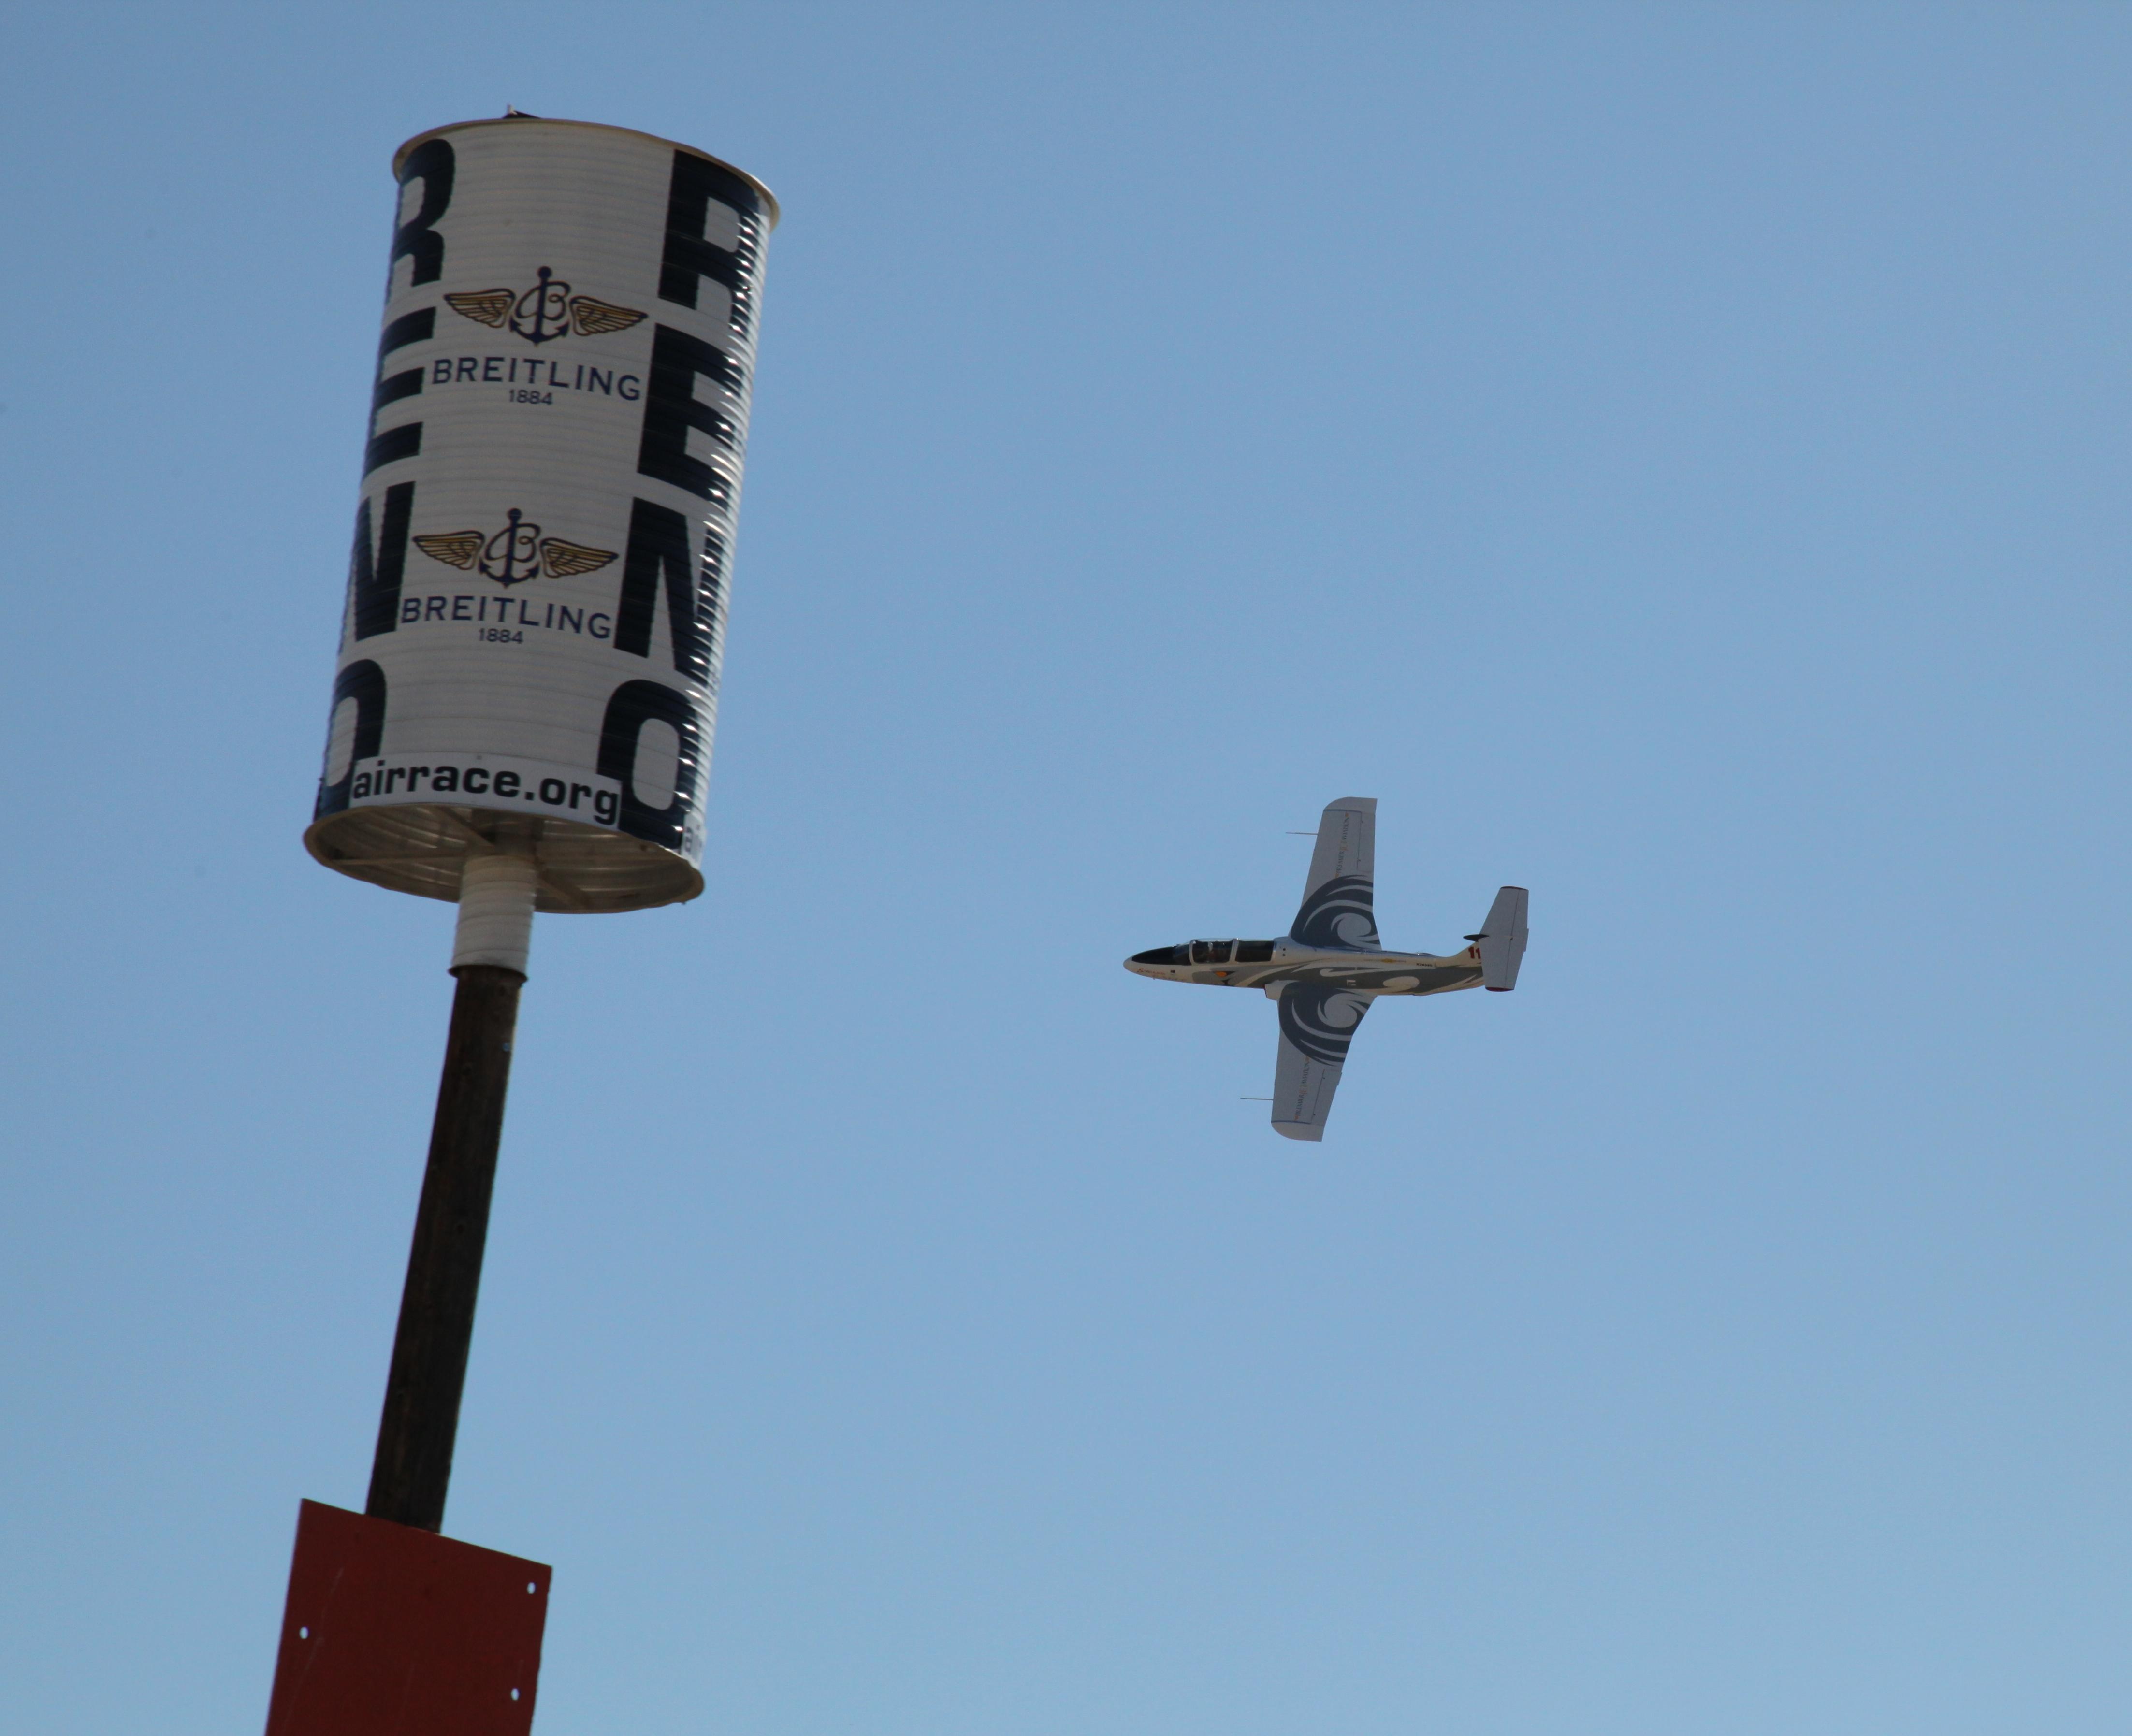 Kokshorn : 29 Screaming Eagle, Race 11, Pilot John Kokshoorn